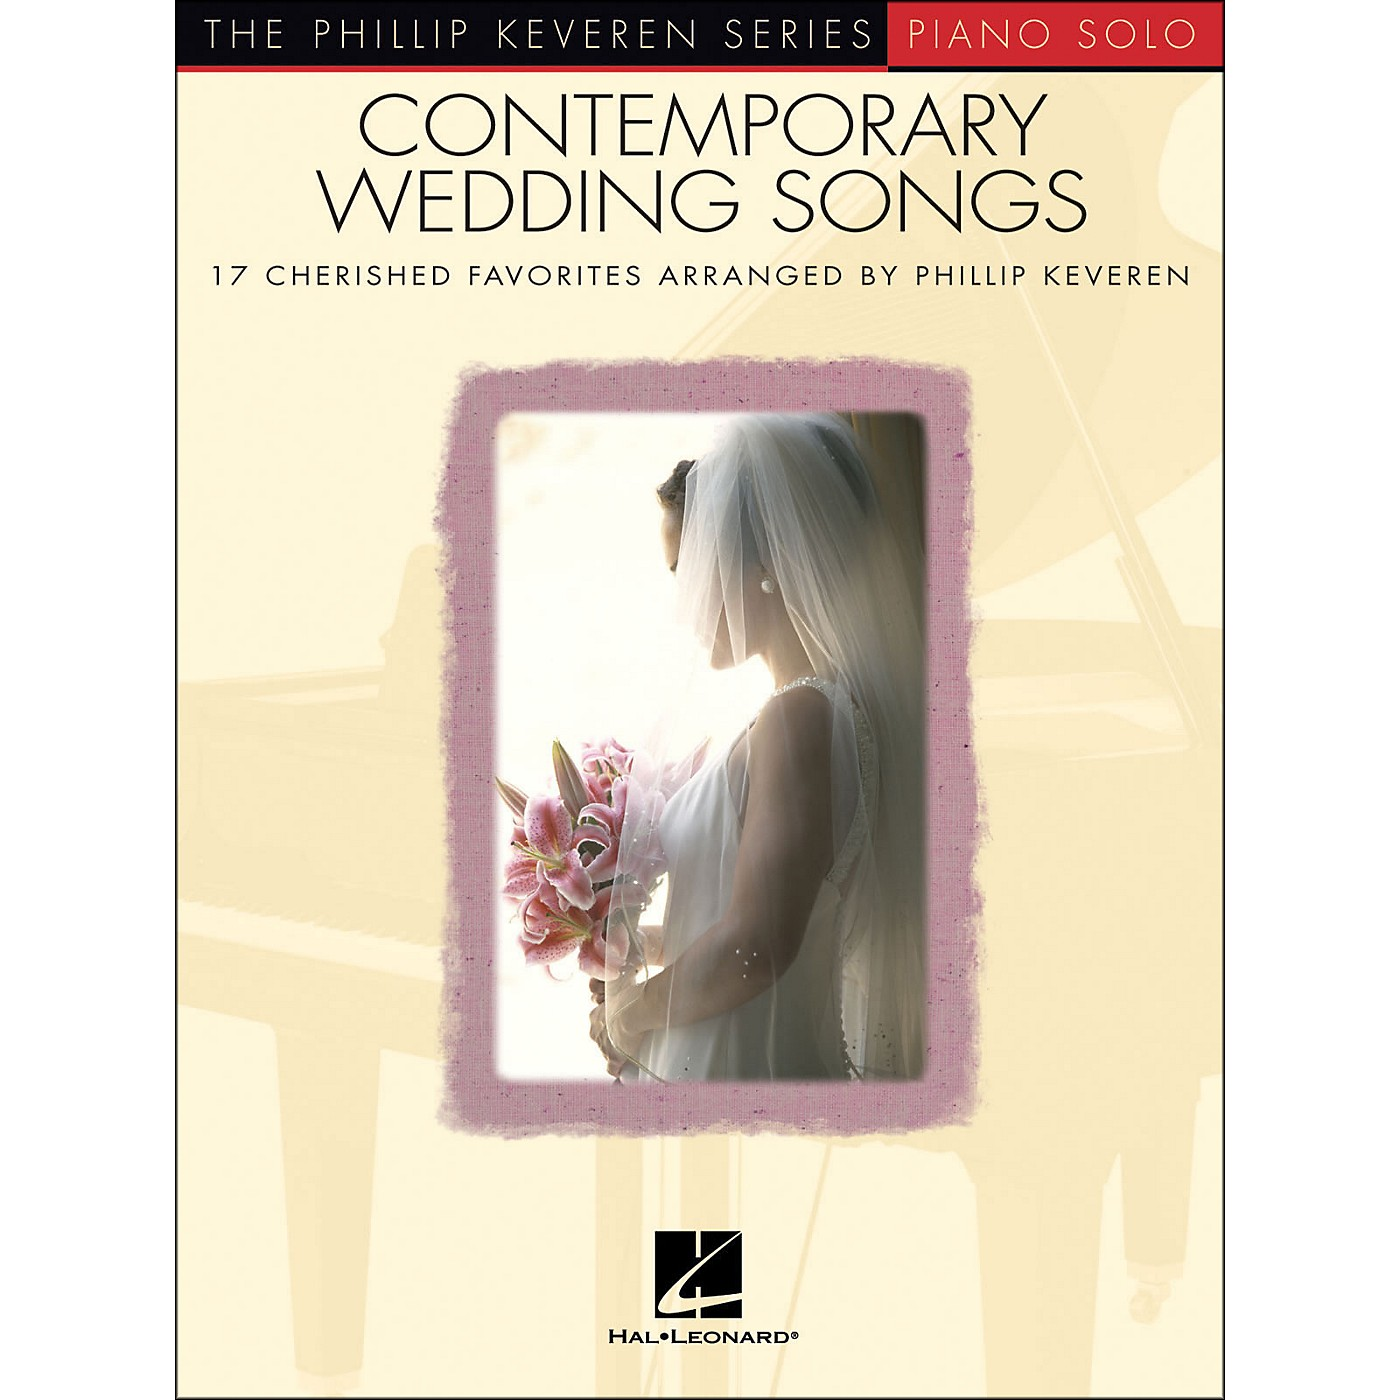 Hal Leonard Contemporary Wedding Songs - Piano Solo - Phillip Keveren Series thumbnail